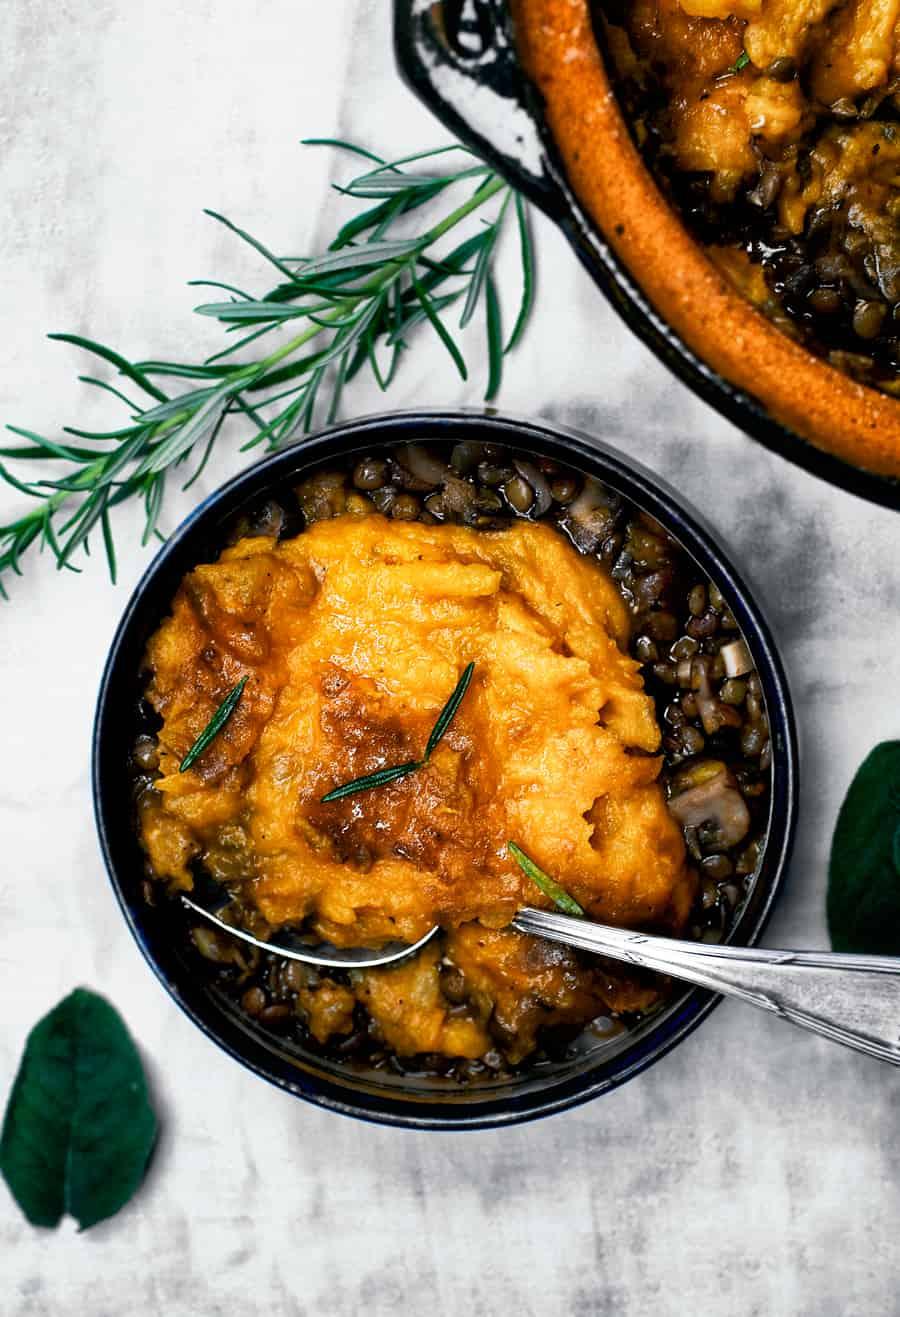 Pumpkin Mushroom Shepherds Pie in a black bowl with rosemary.